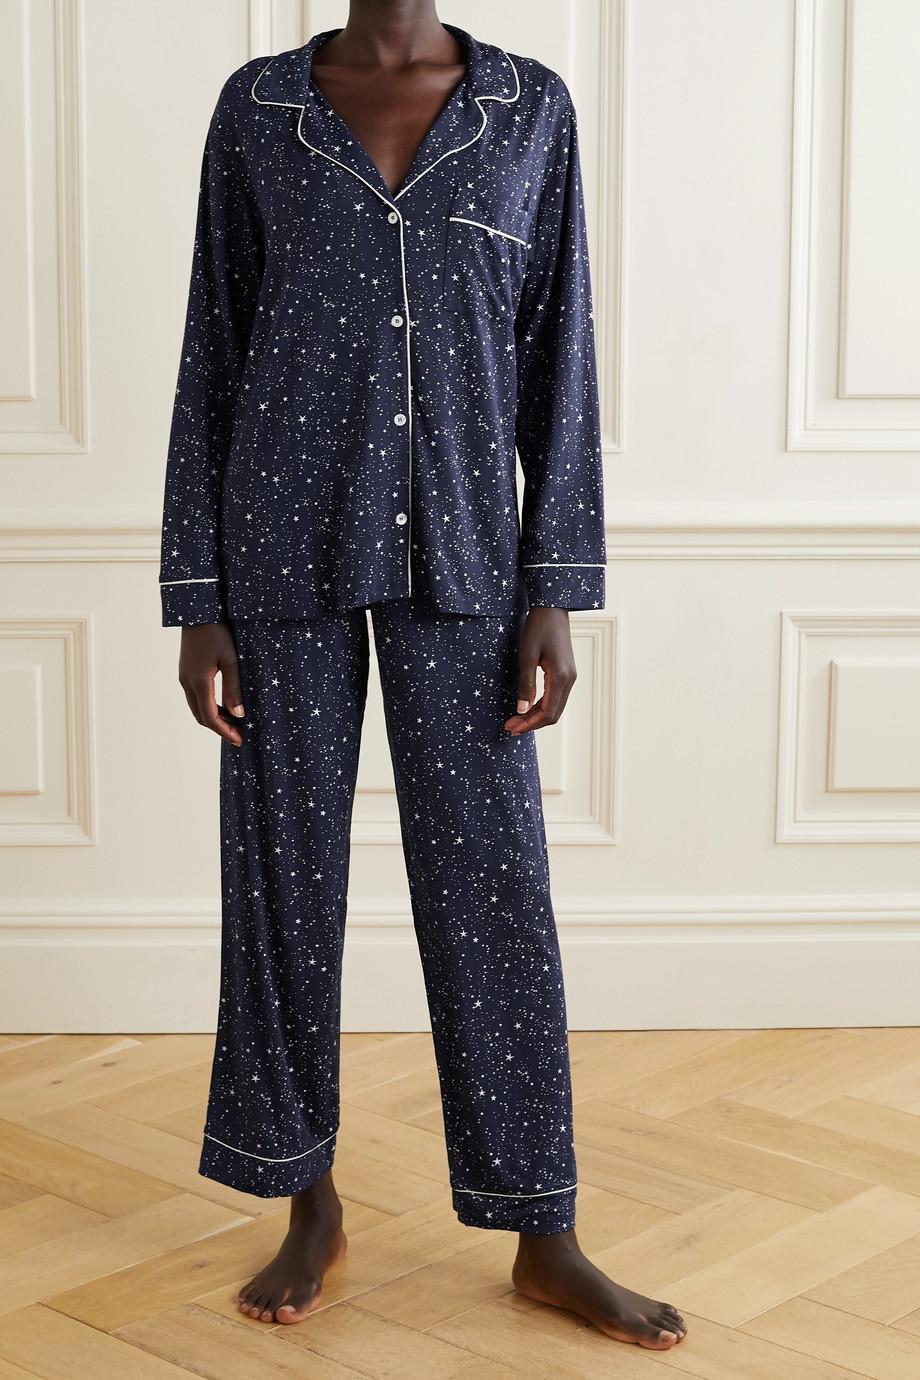 Eberjey Gisele Pyjama aus Stretch-Modal mit Print und Paspeln